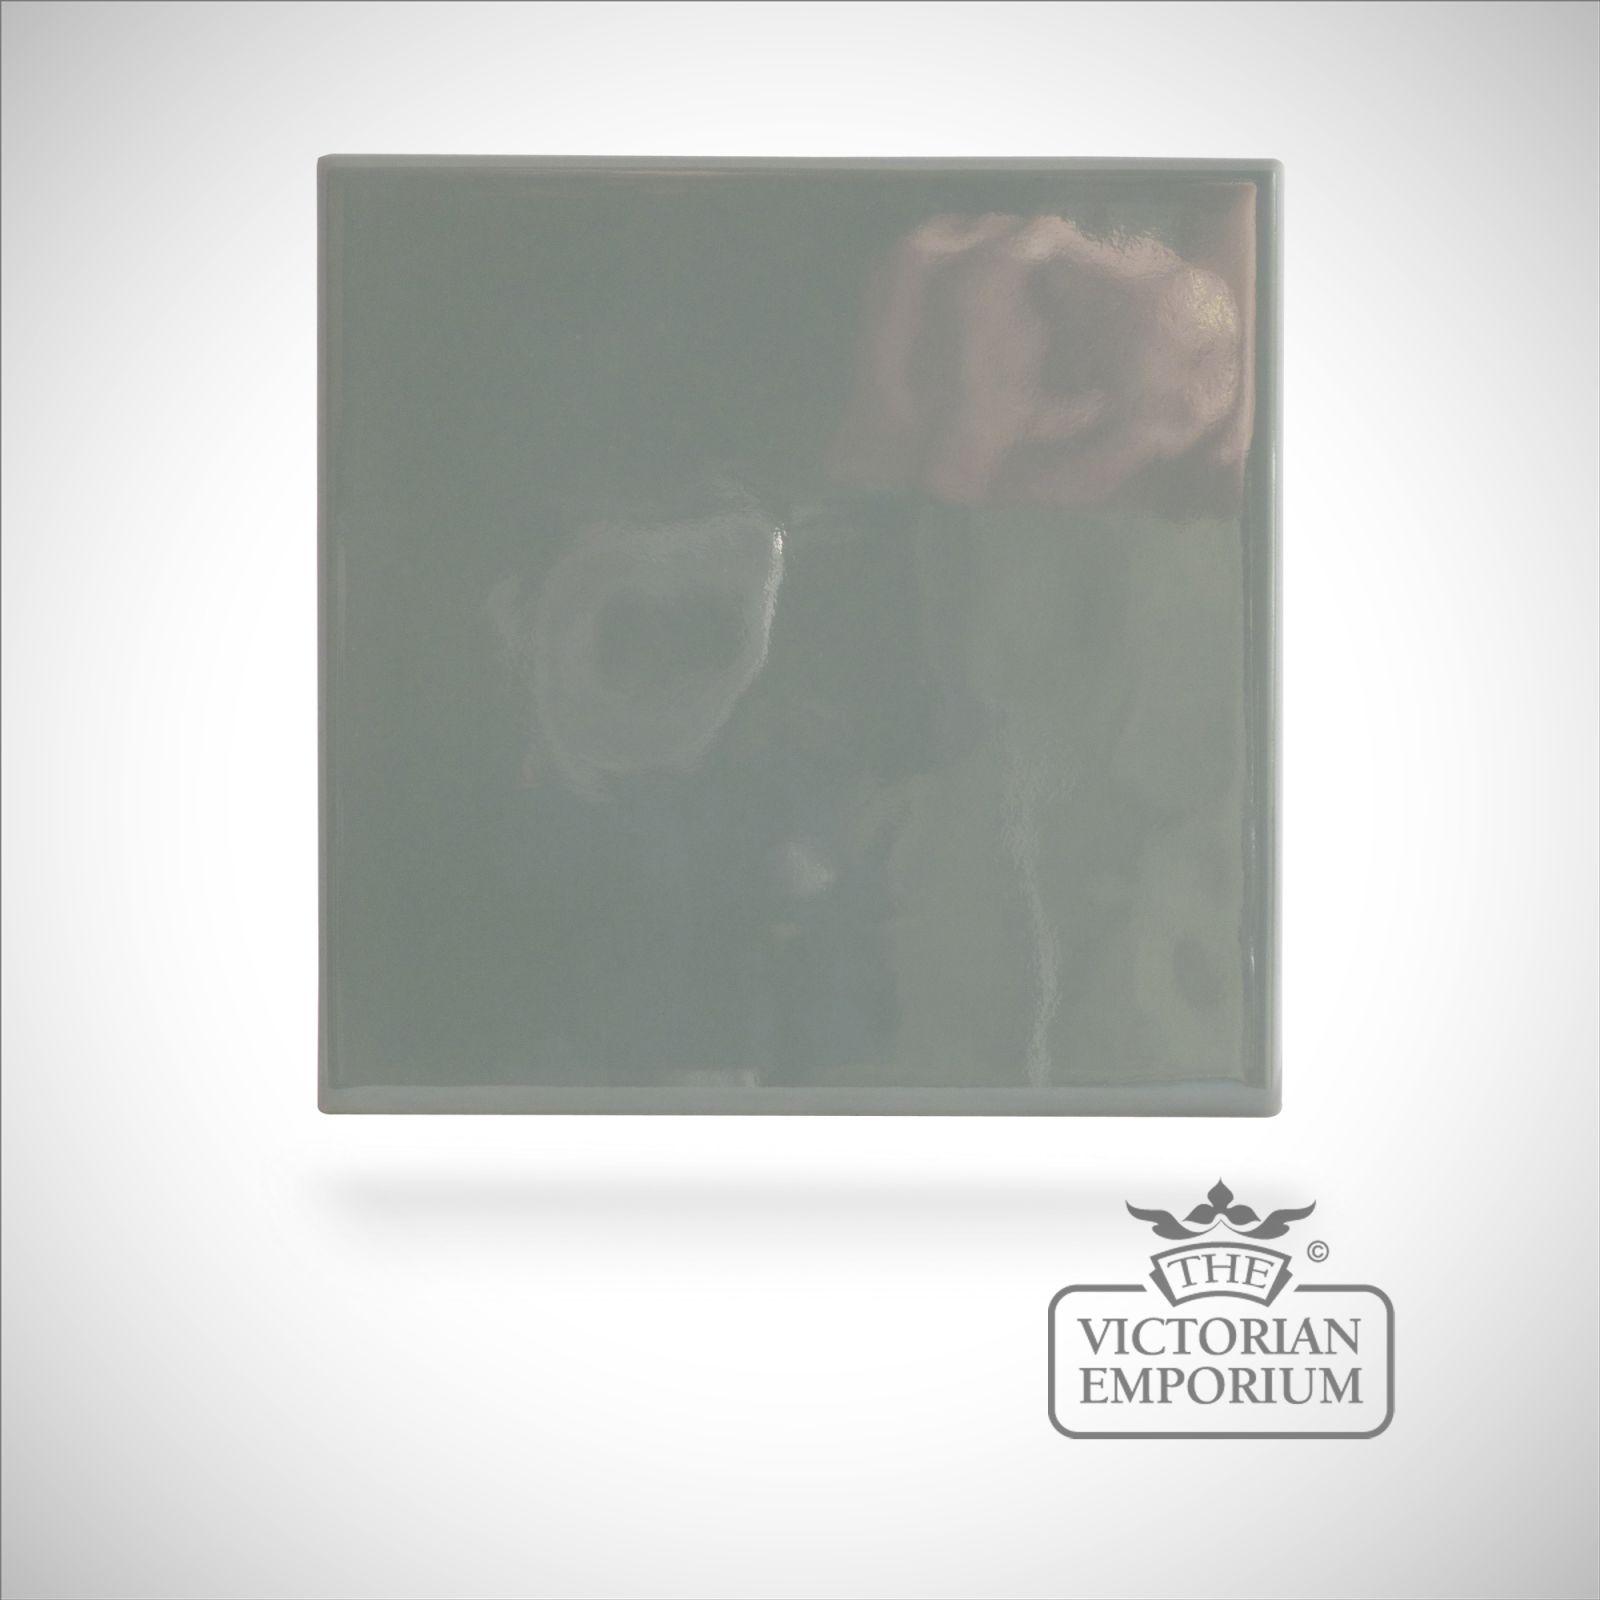 lustres waltz 110x110mm hand crafted lustres tiles. Black Bedroom Furniture Sets. Home Design Ideas